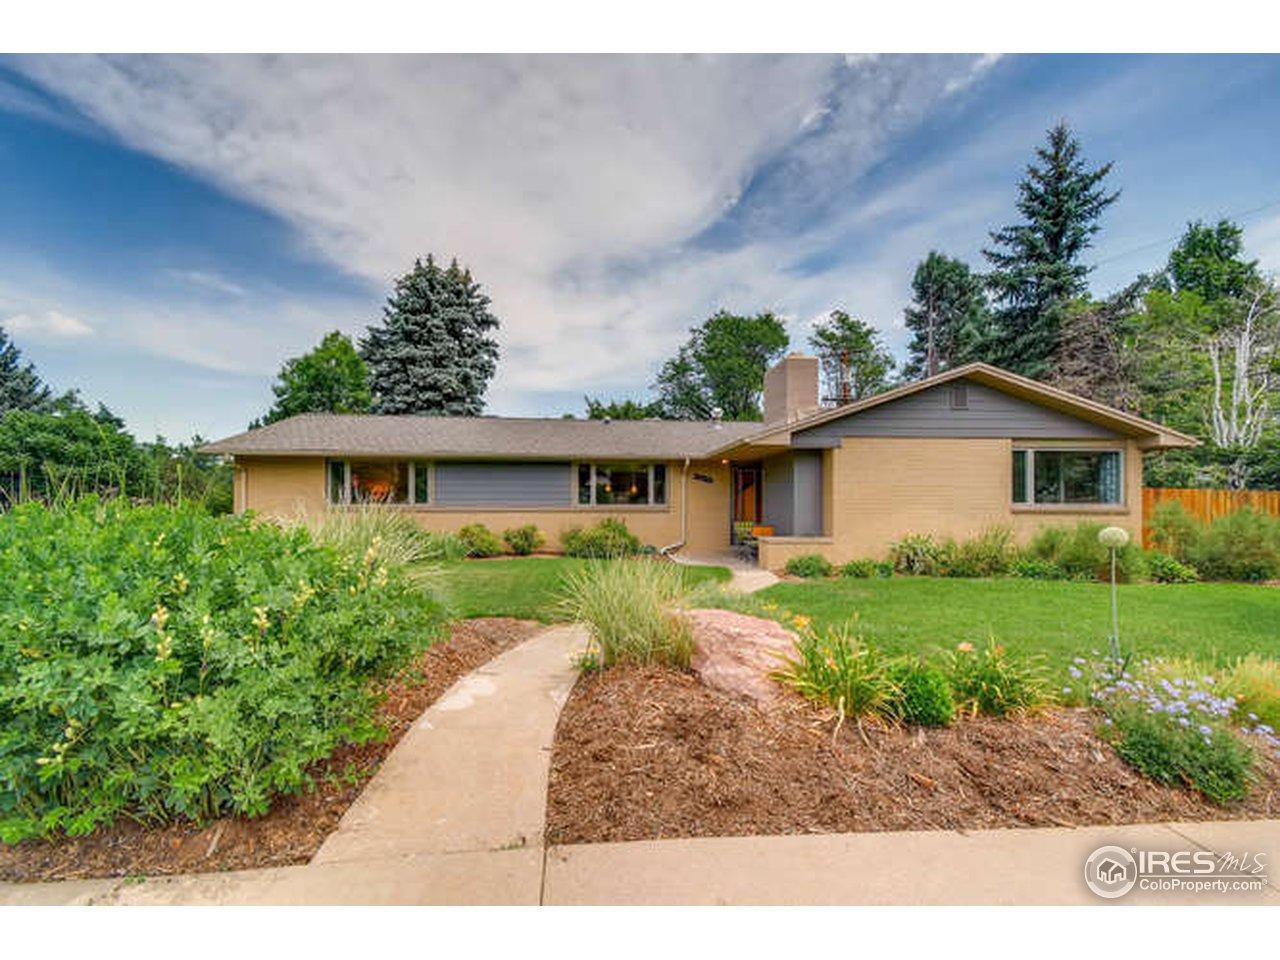 3210 20th St, Boulder CO 80304